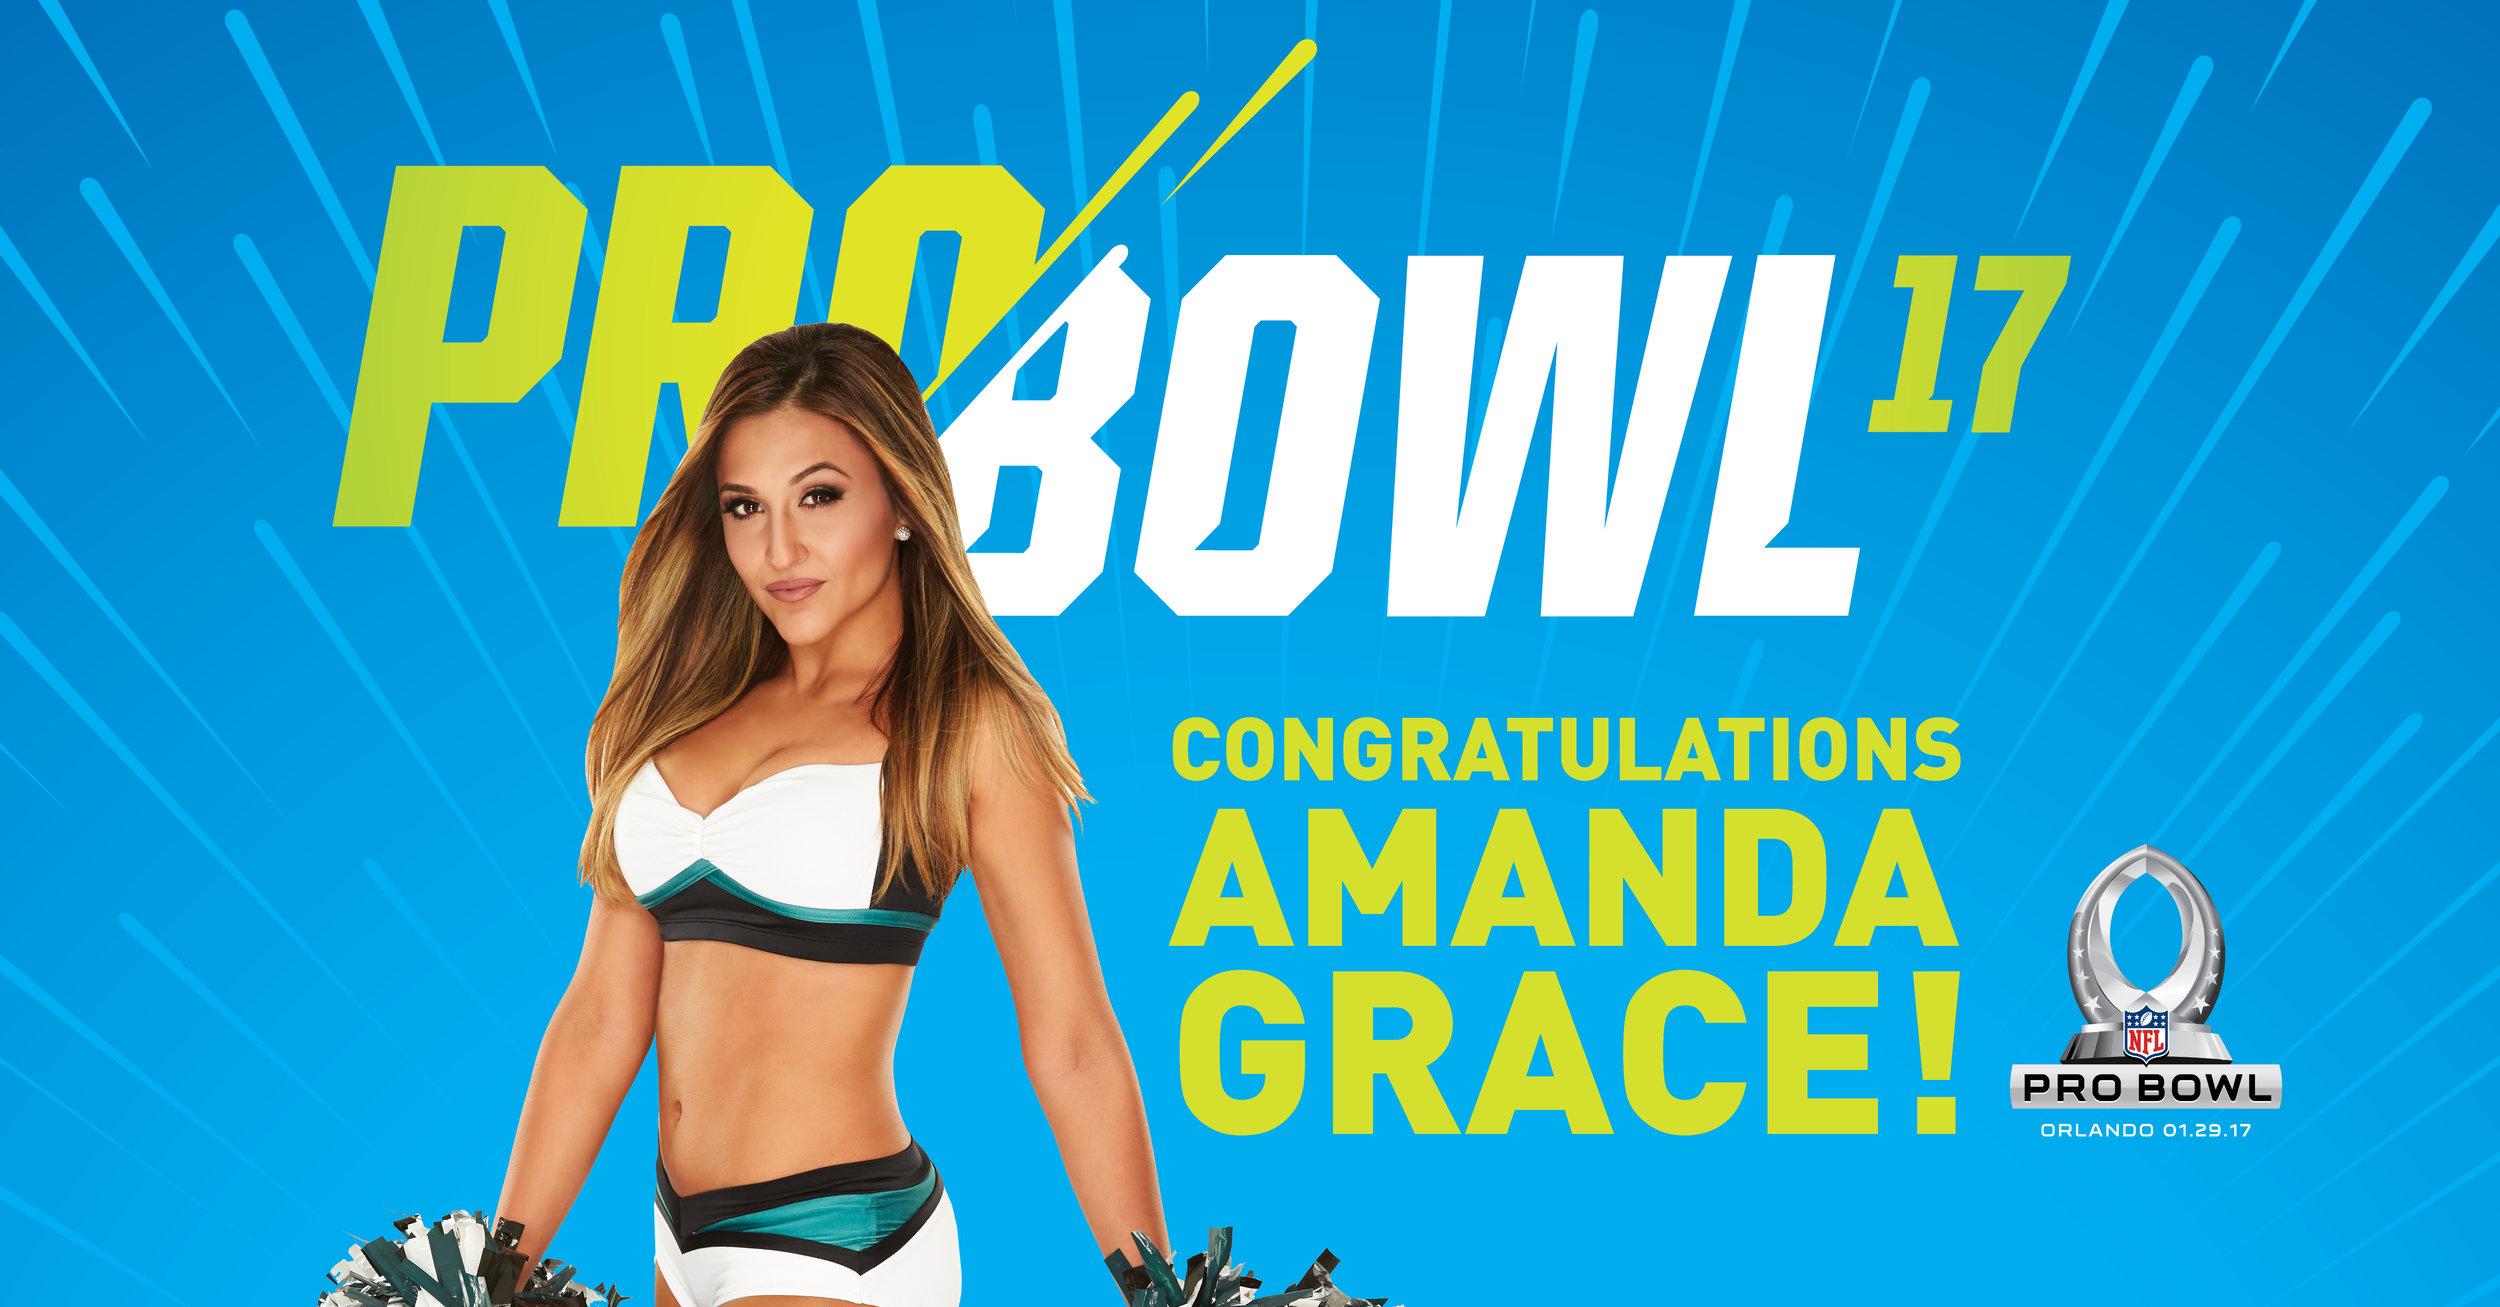 ProBowl-AmandaGrace1200x627.jpg